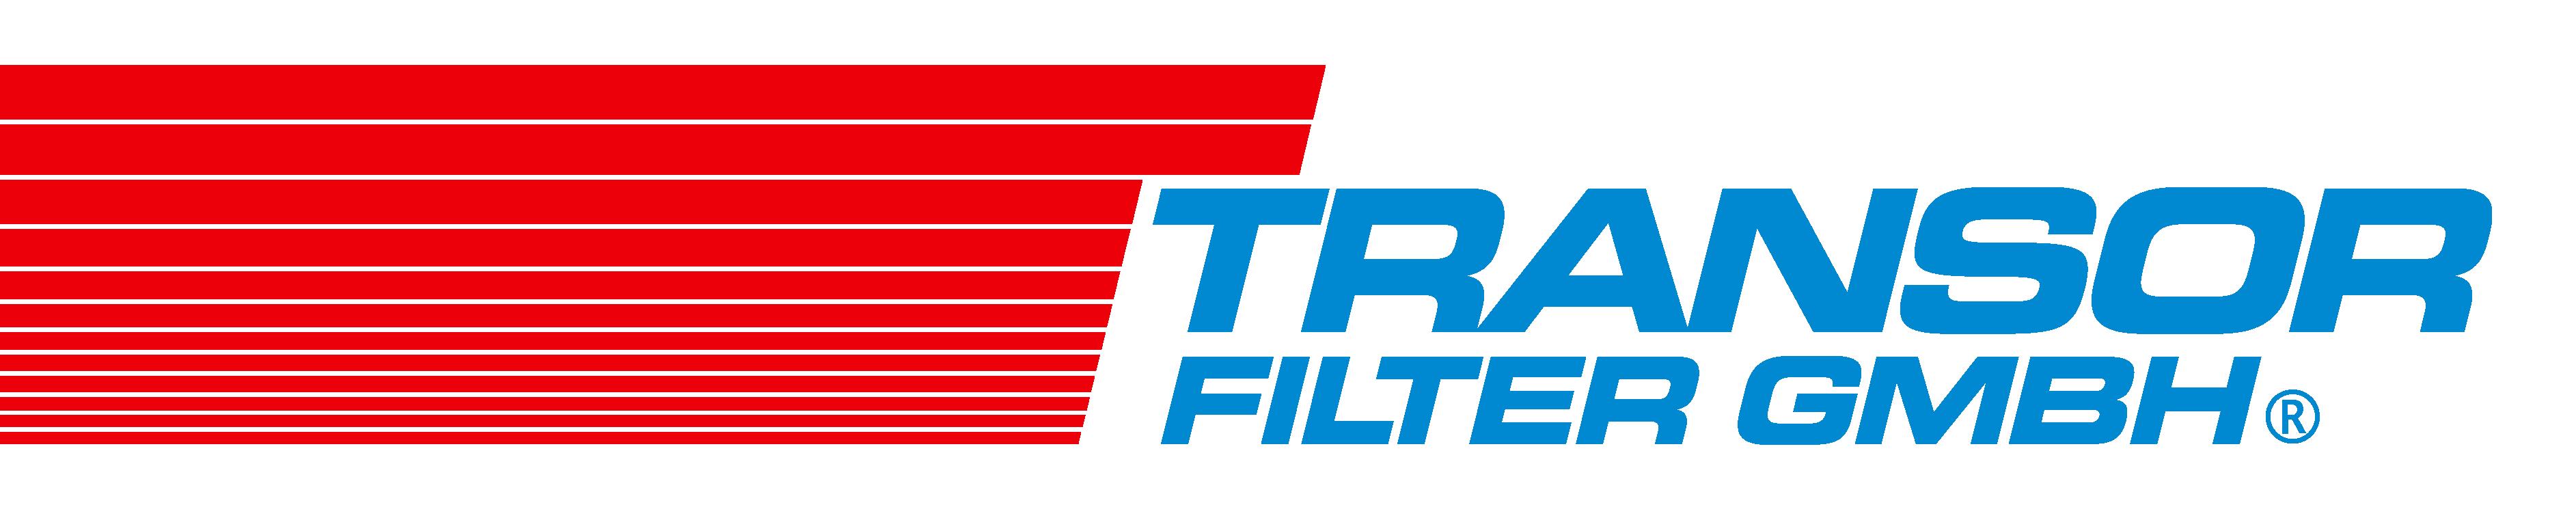 Transor